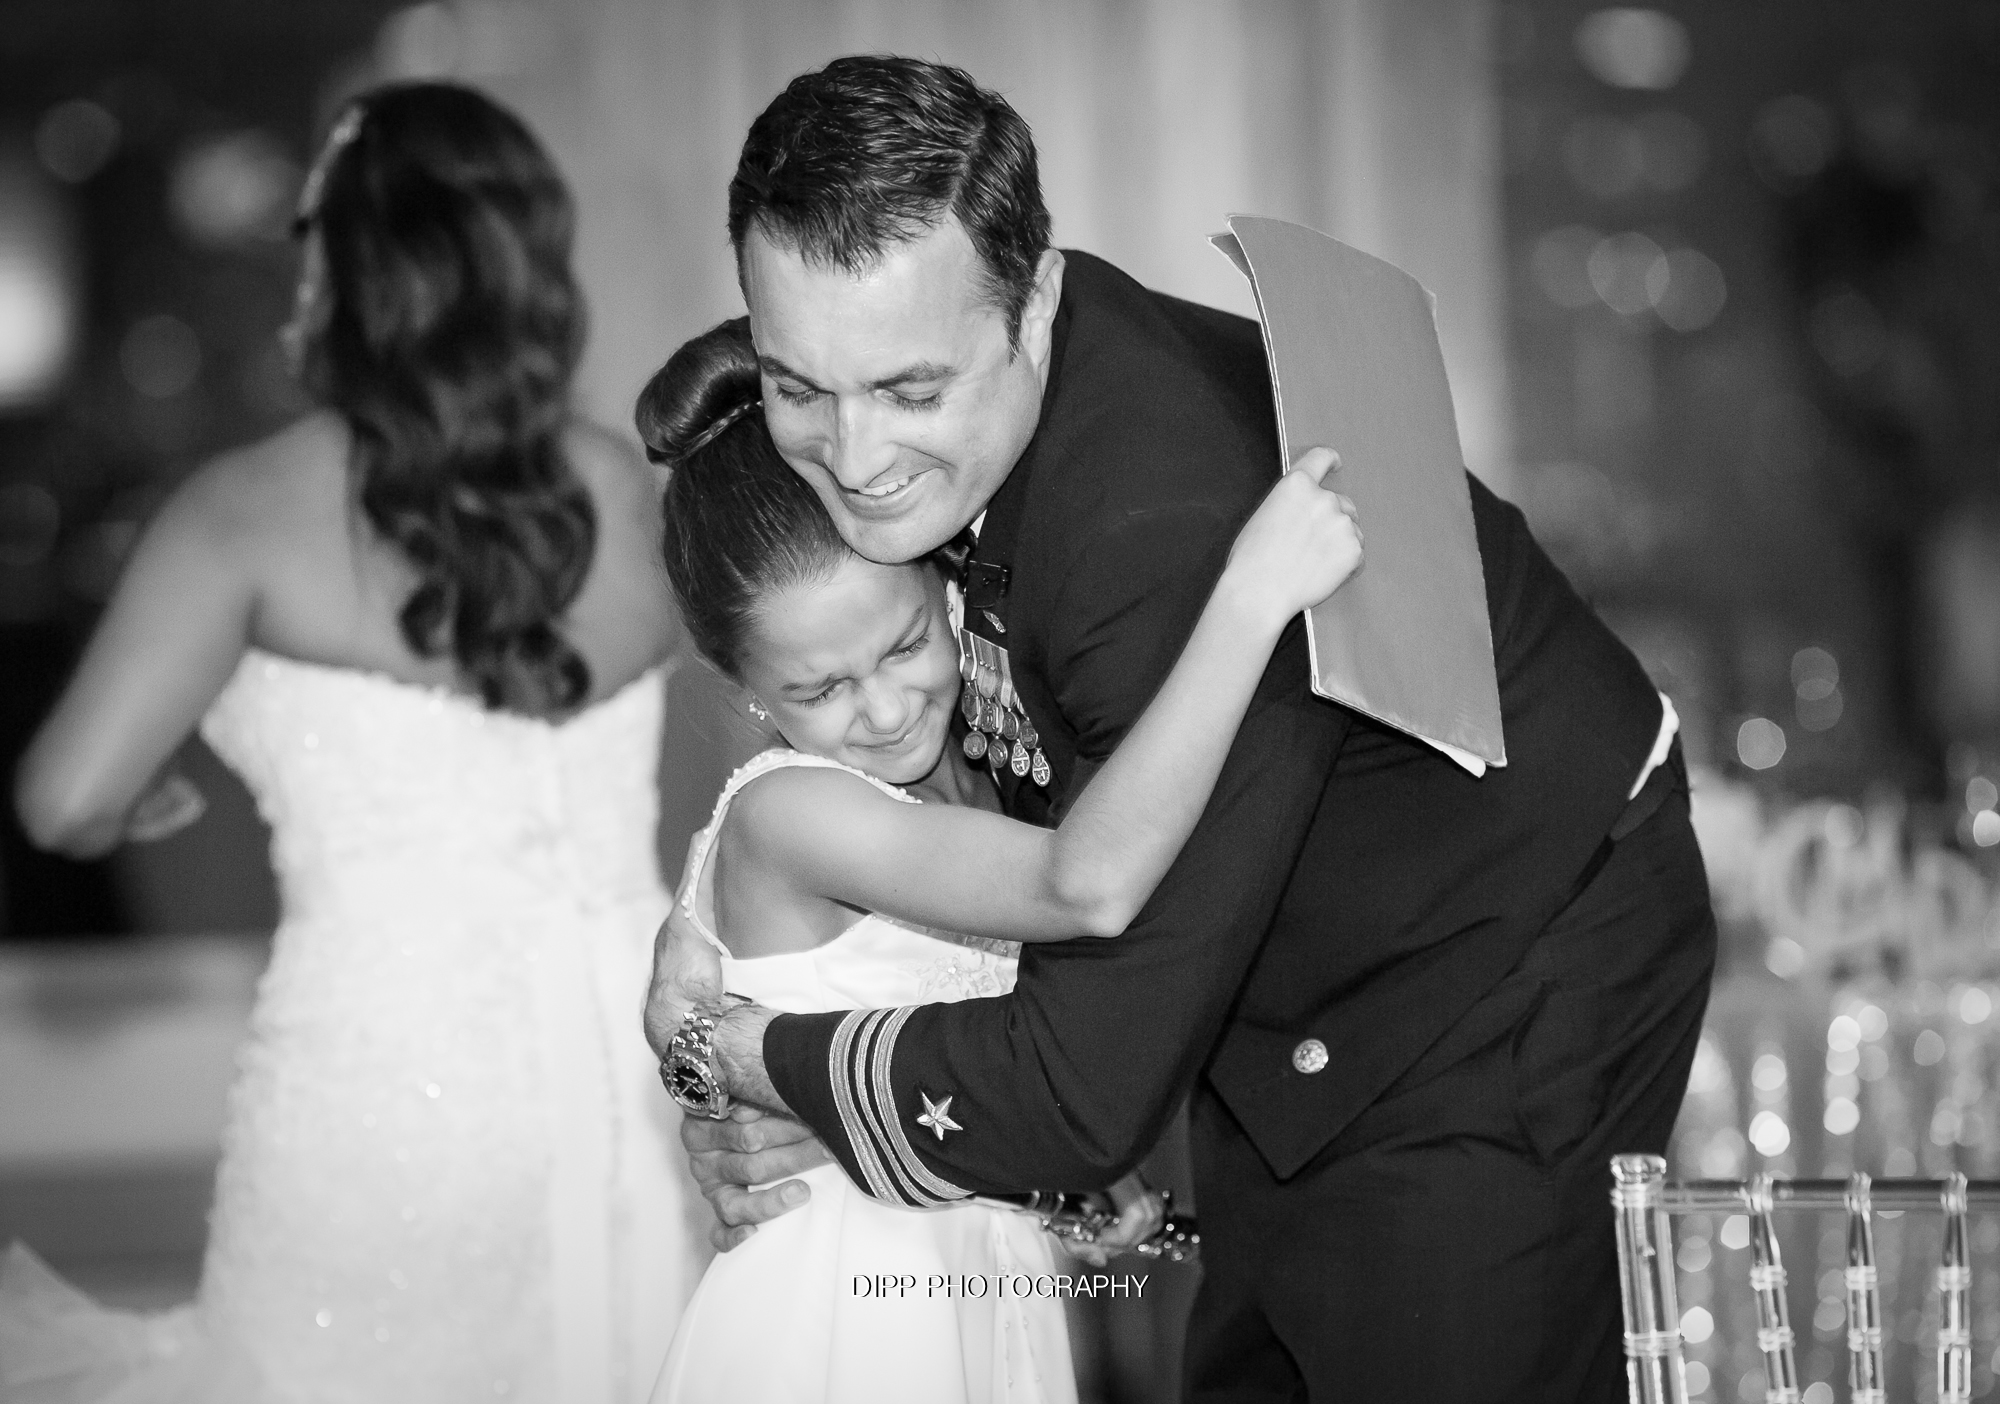 Dipp_2016 EDITED Sara & Brandon Wedding-542